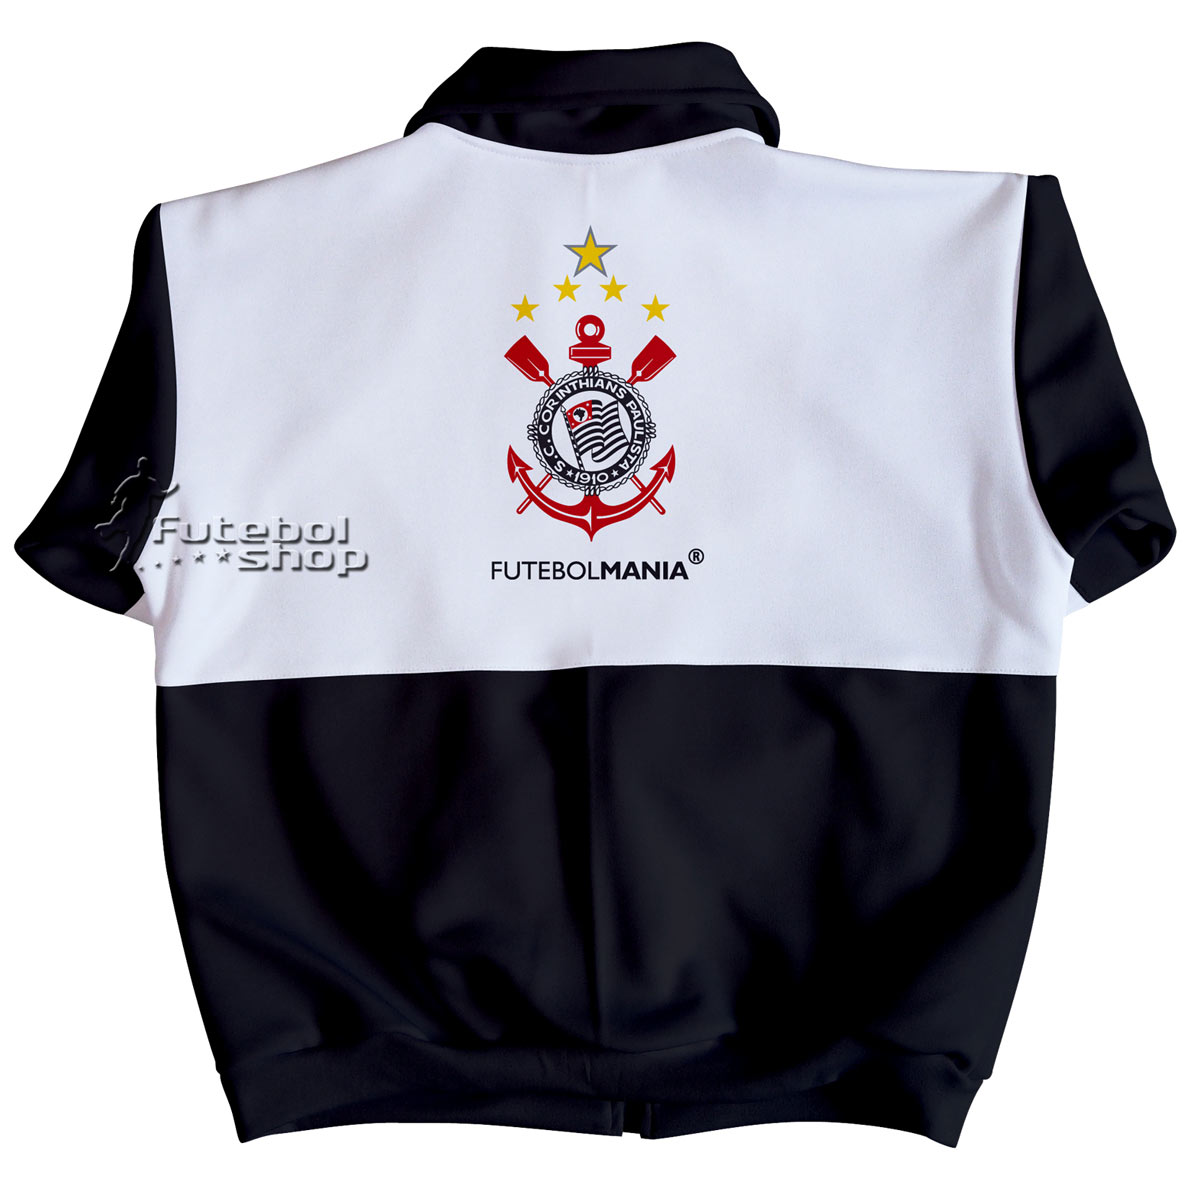 Jaqueta Juvenil do Corinthians de Malha Esportiva - 224B